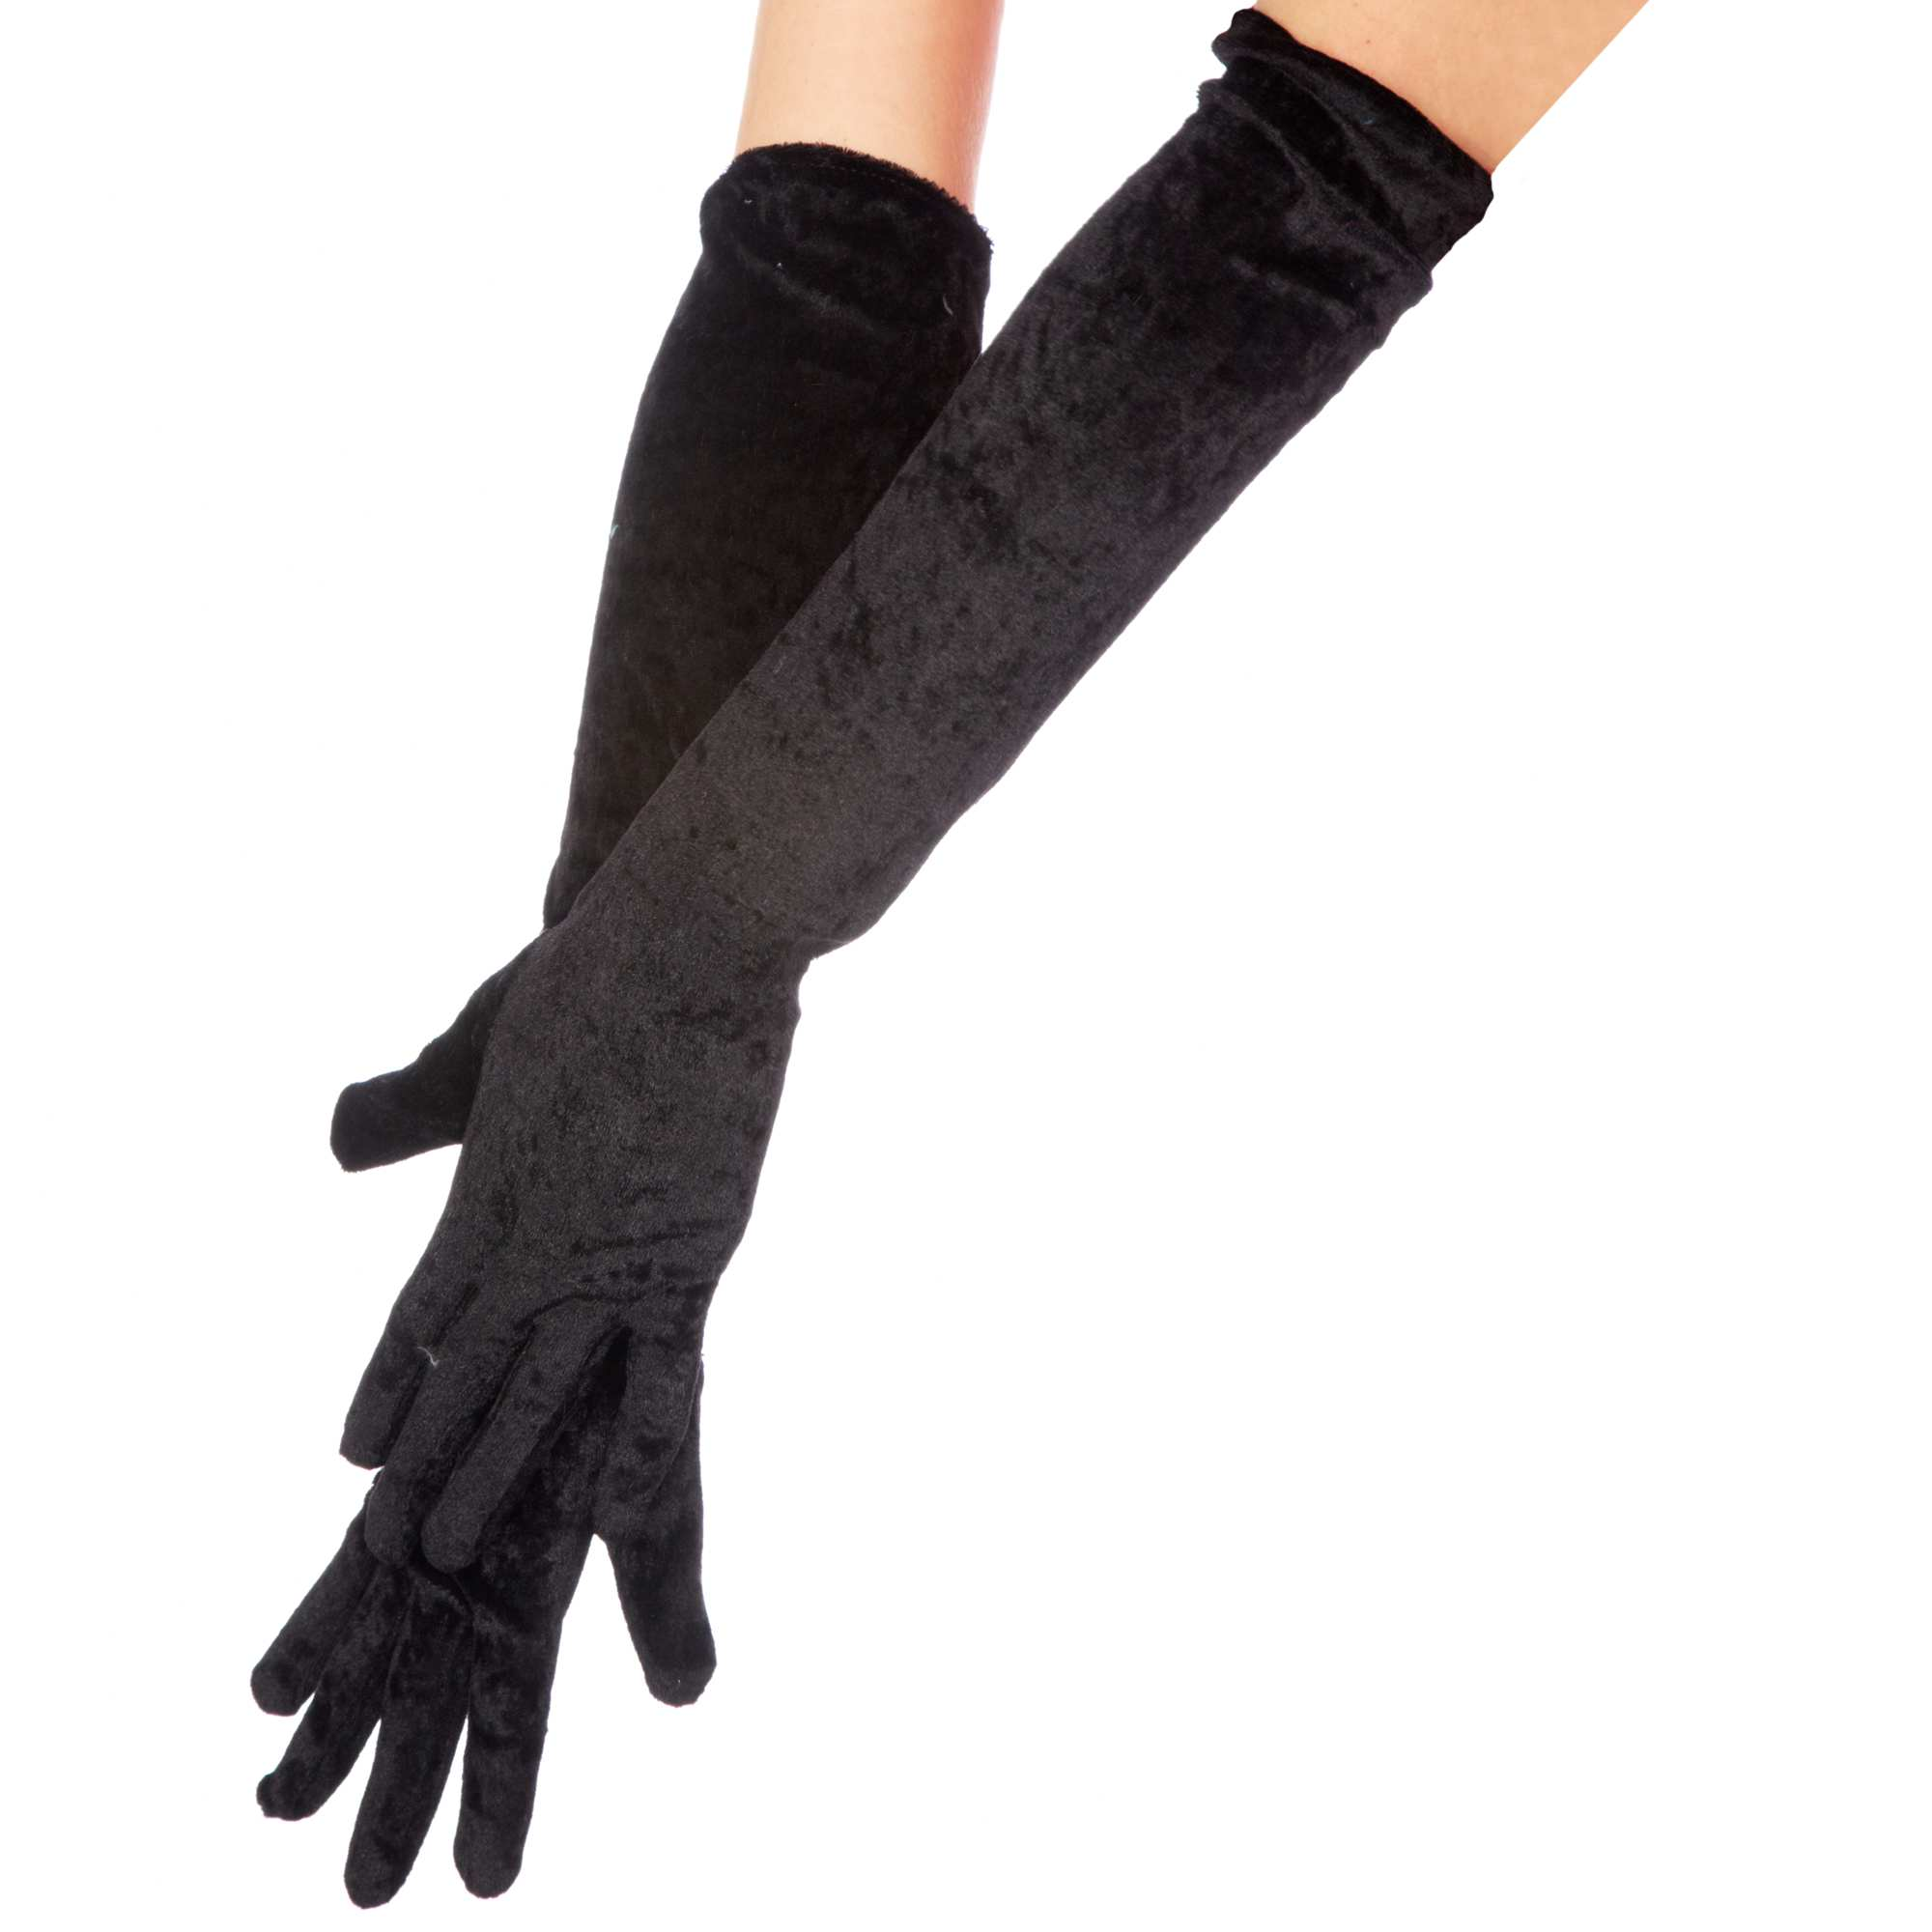 longs gants unis en velours accessoires noir kiabi 4 00. Black Bedroom Furniture Sets. Home Design Ideas